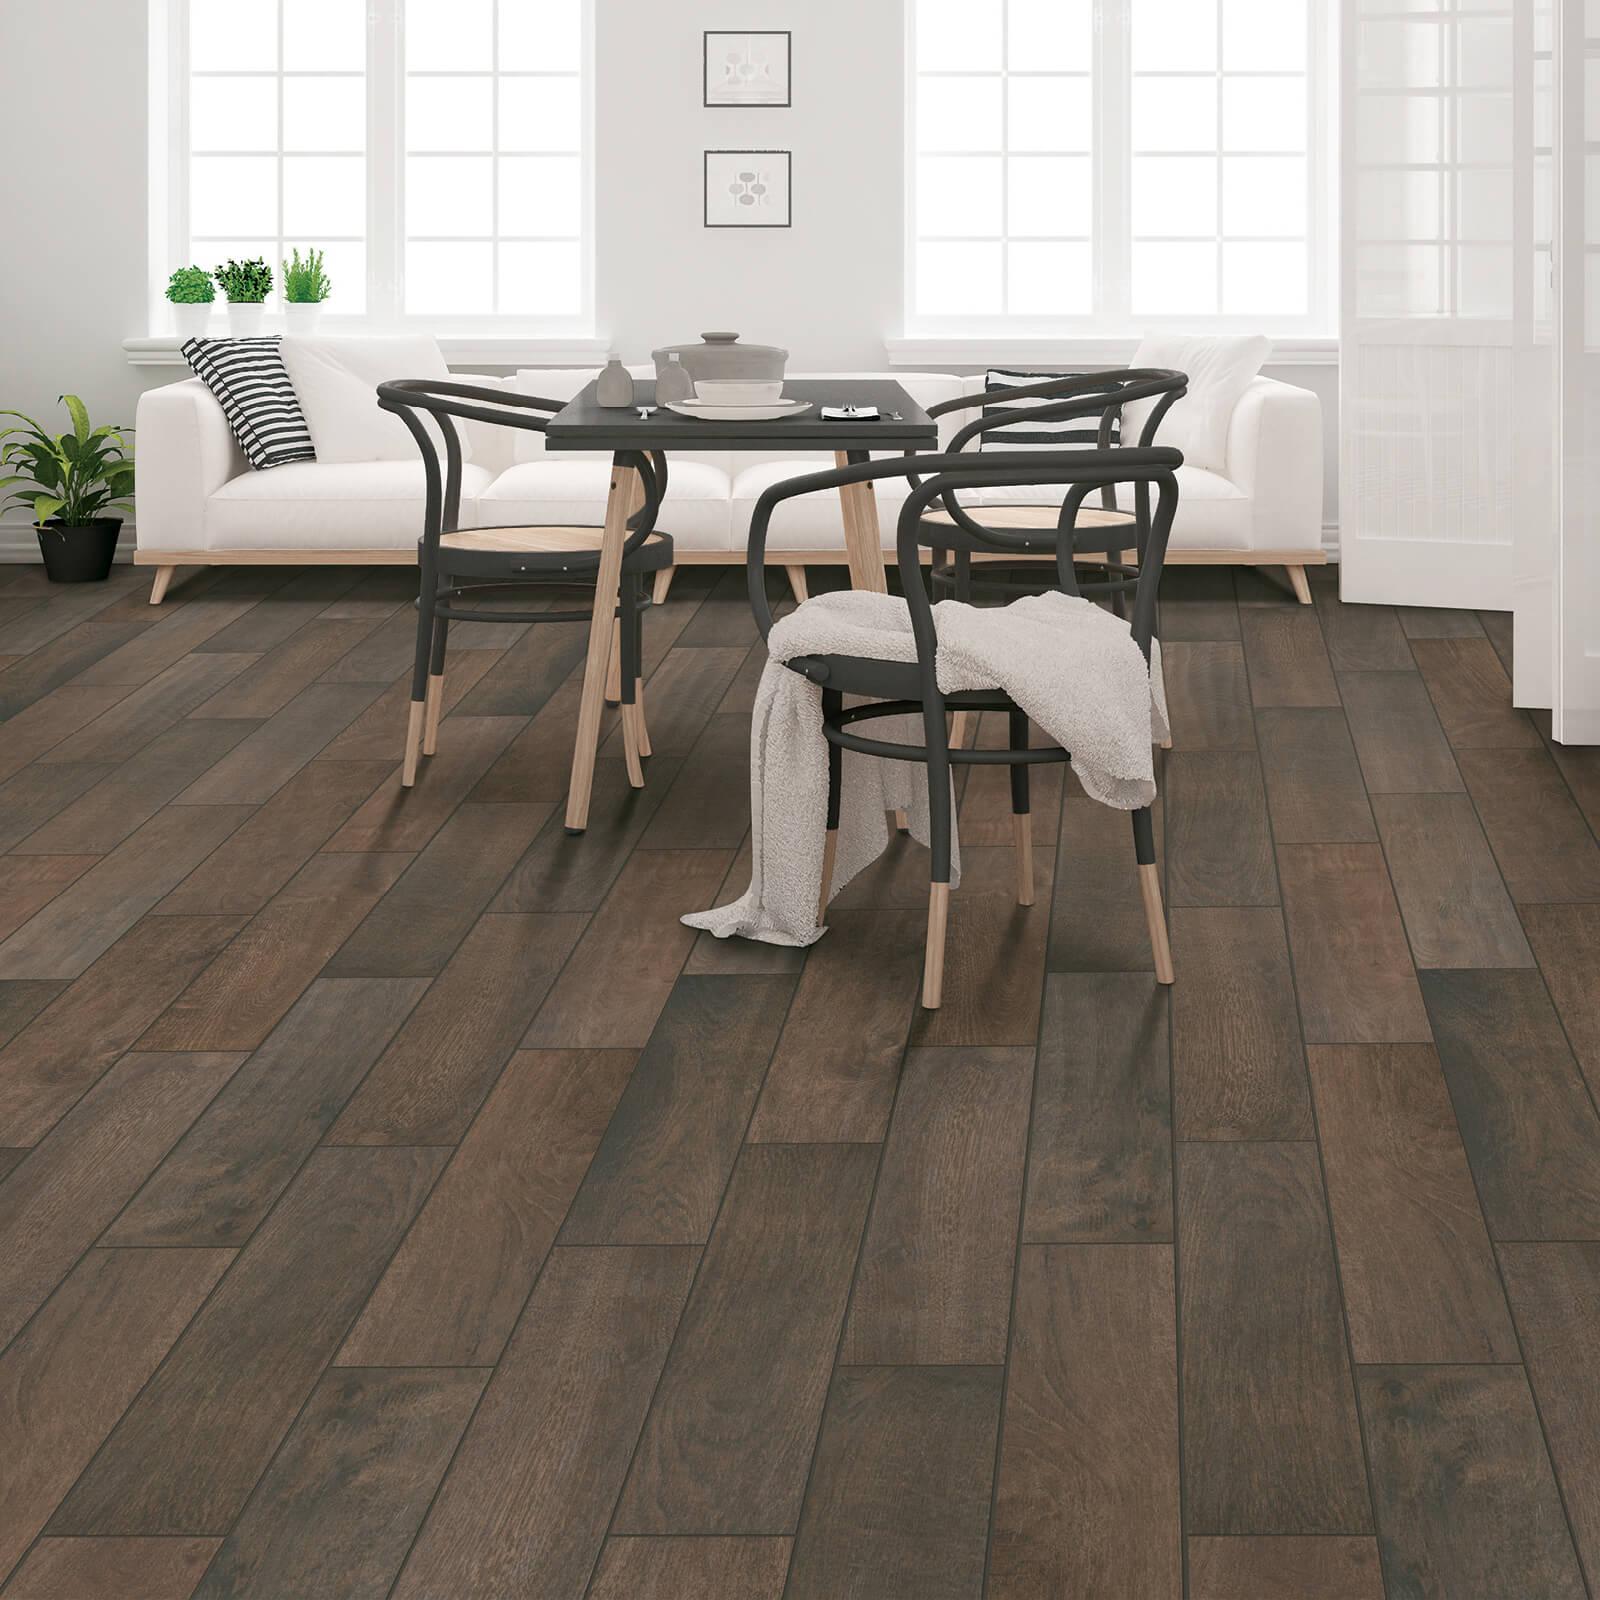 Madison Creek Hazelnut Spice flooring | Dolphin Carpet & Tile